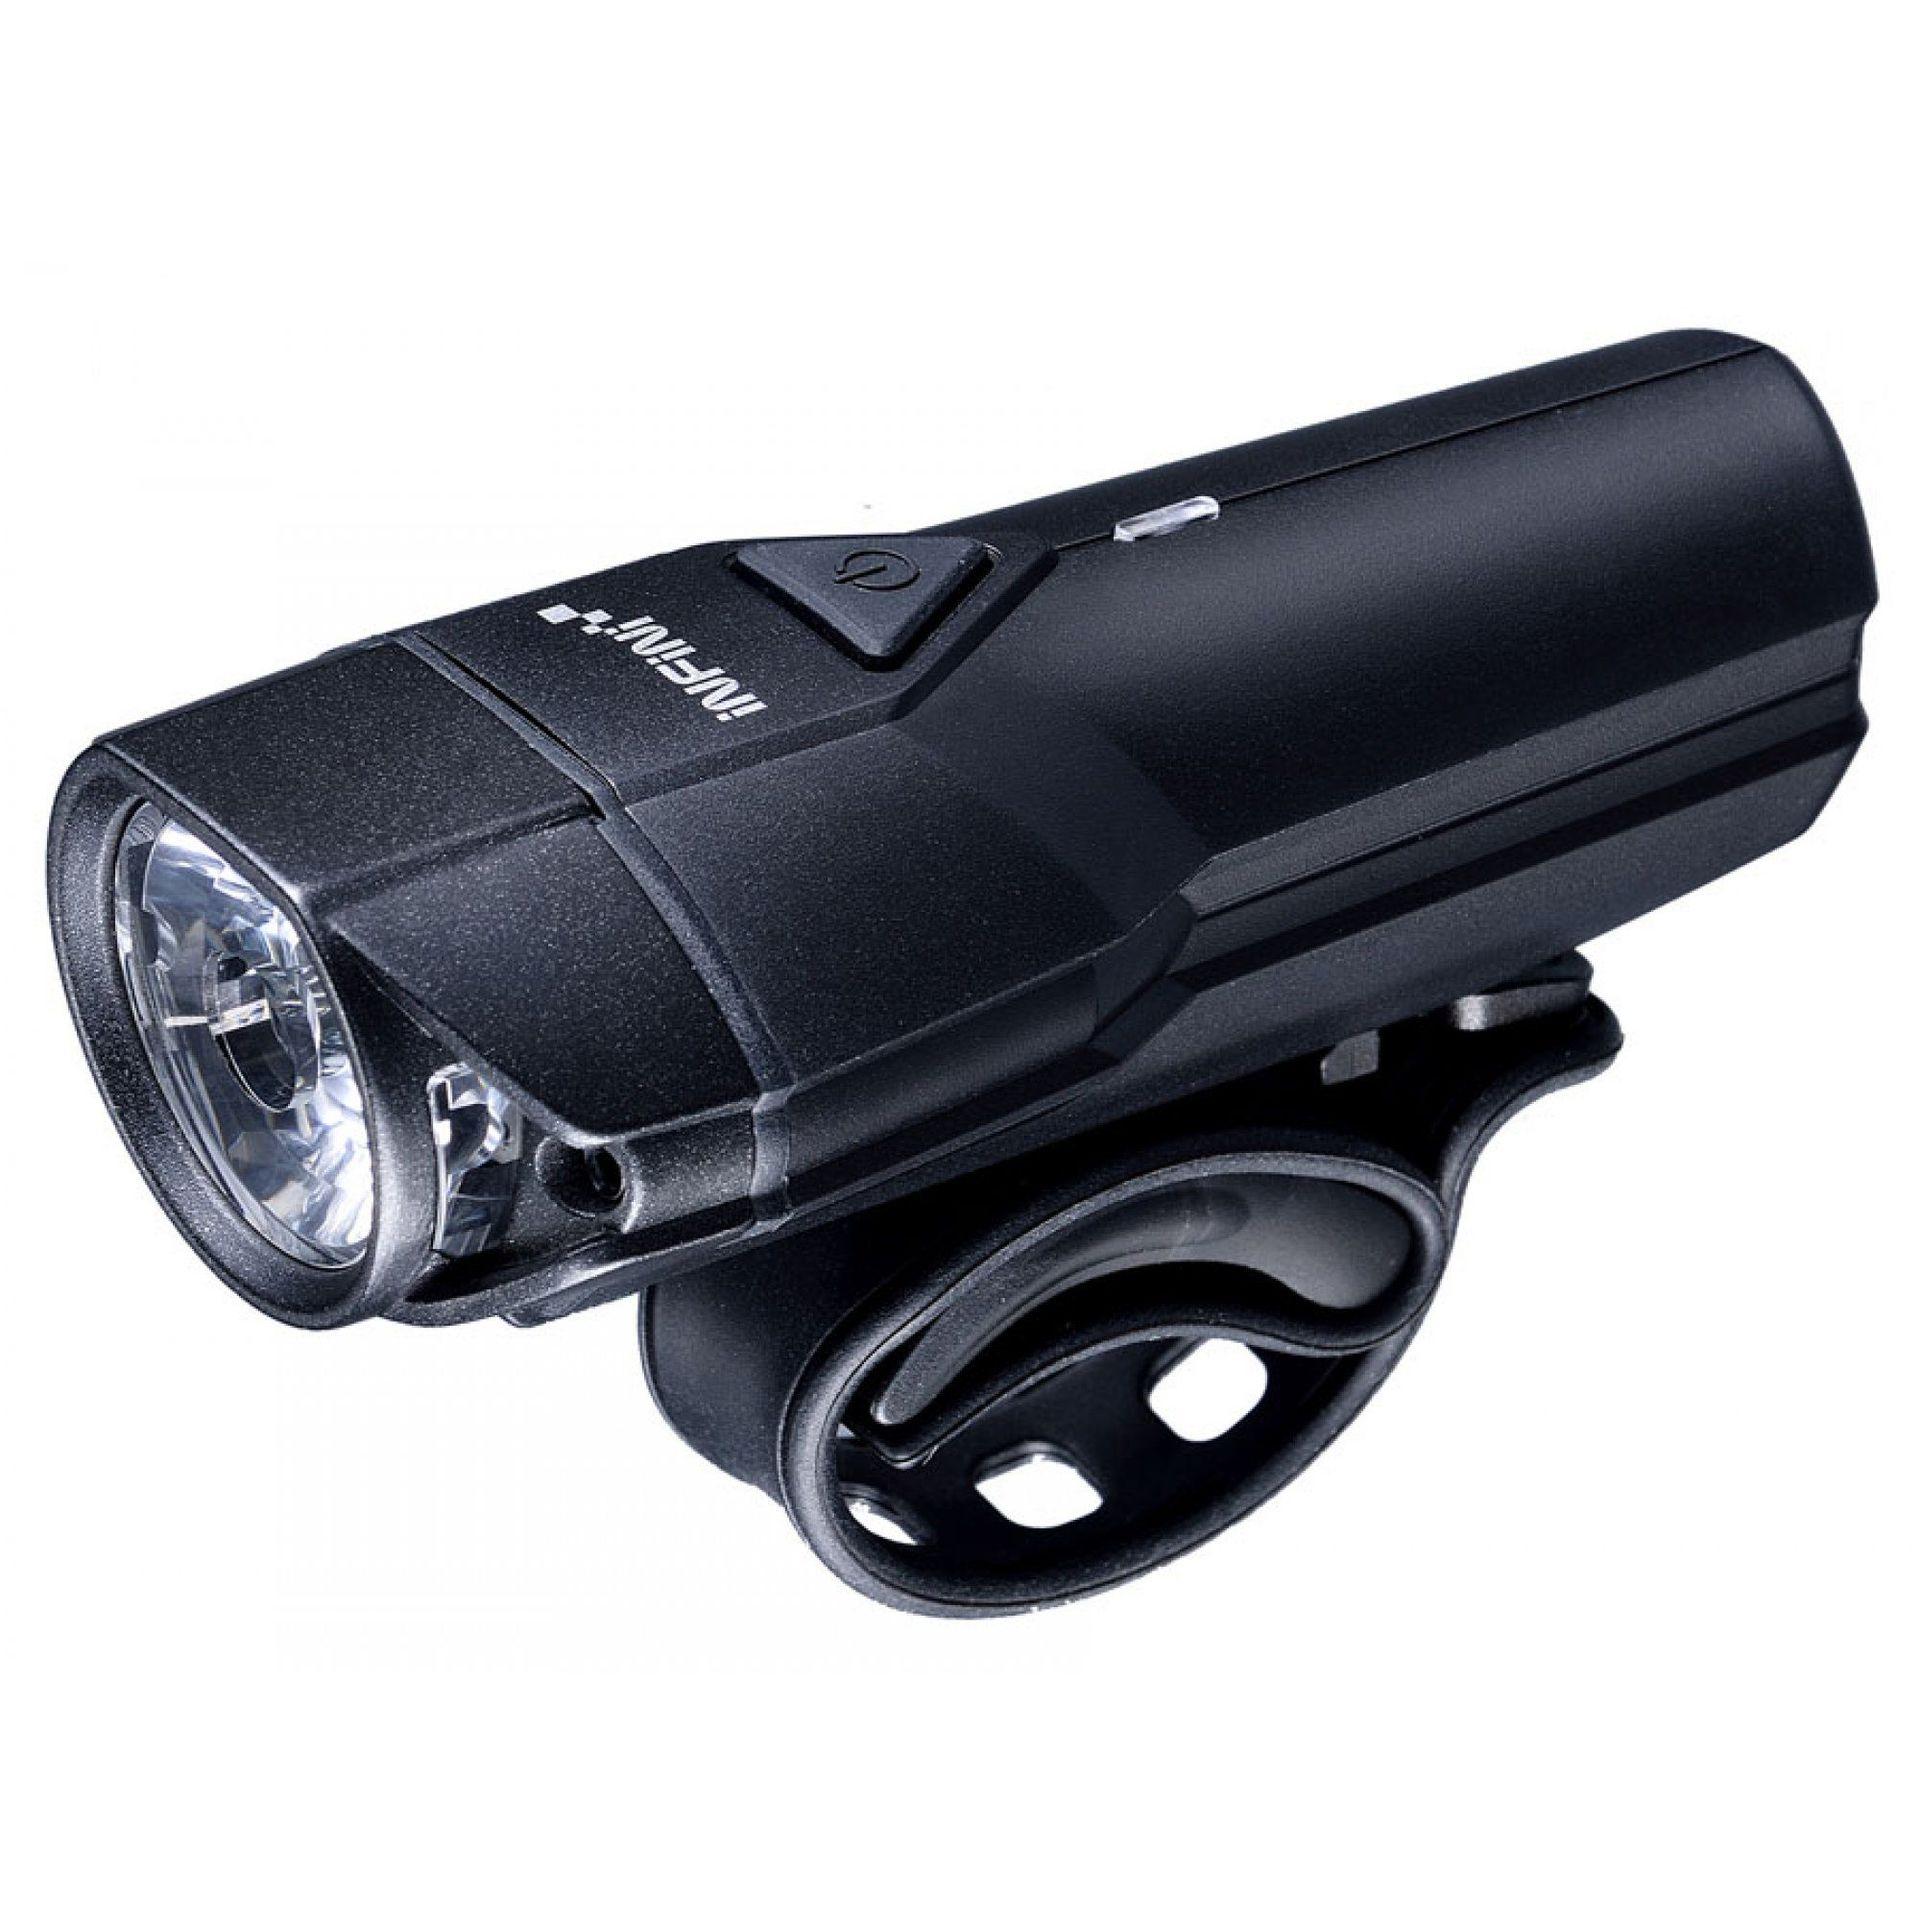 LAMPKA ROWEROWA PRZEDNIA INFINI LAVA 500 10W BLACK